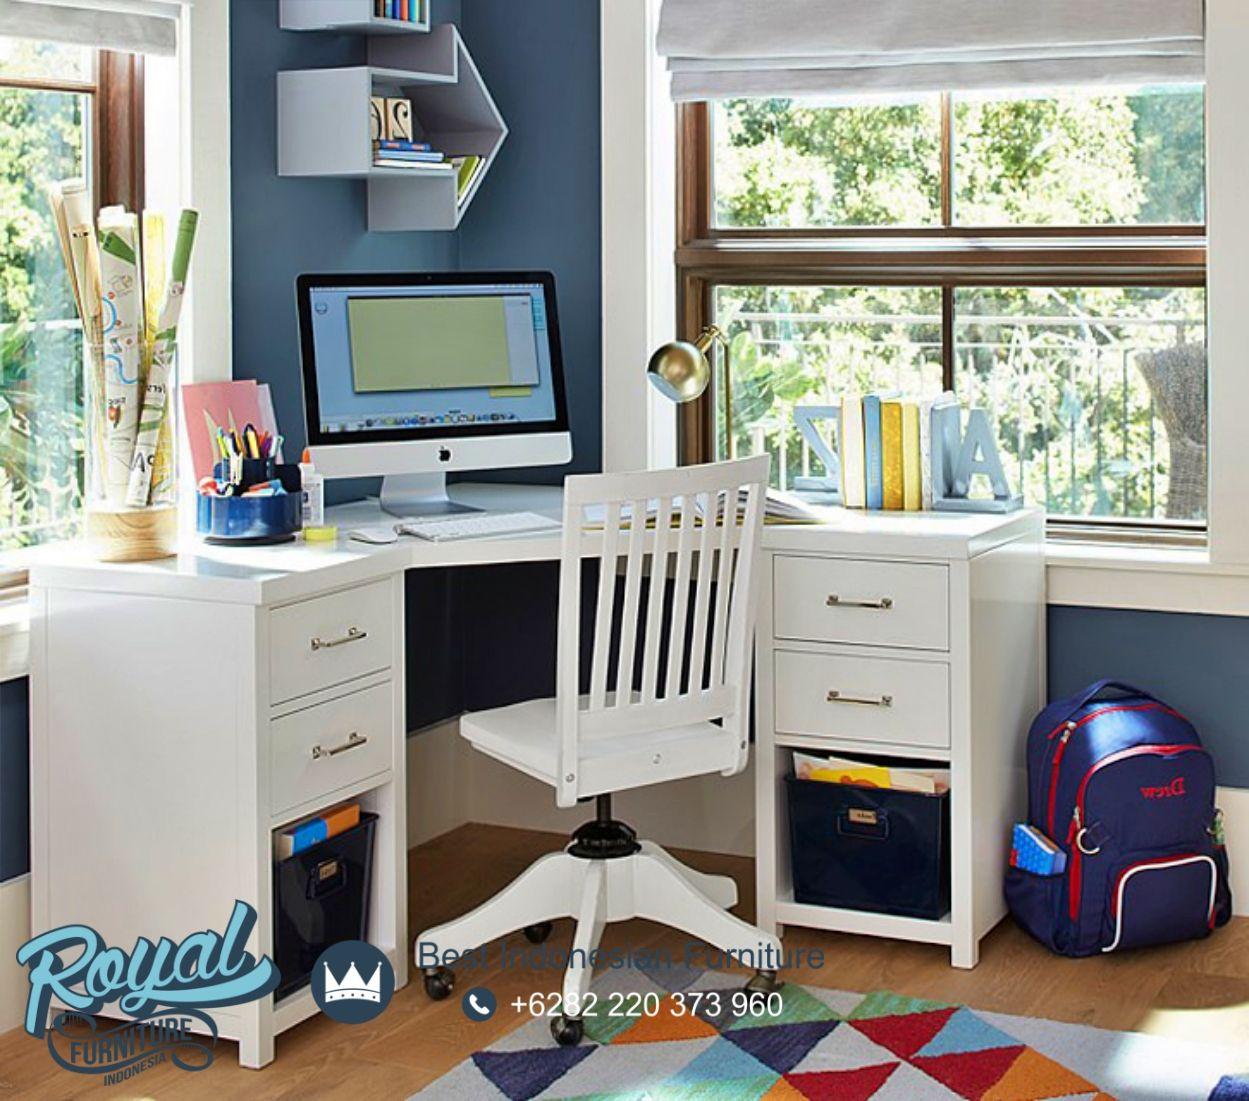 Meja Belajar Minimalis Sudut Kayu Jepara Putih Duco Royal Furniture Jepara Meja Belajar Meja Kayu Meja belajar sudut minimalis